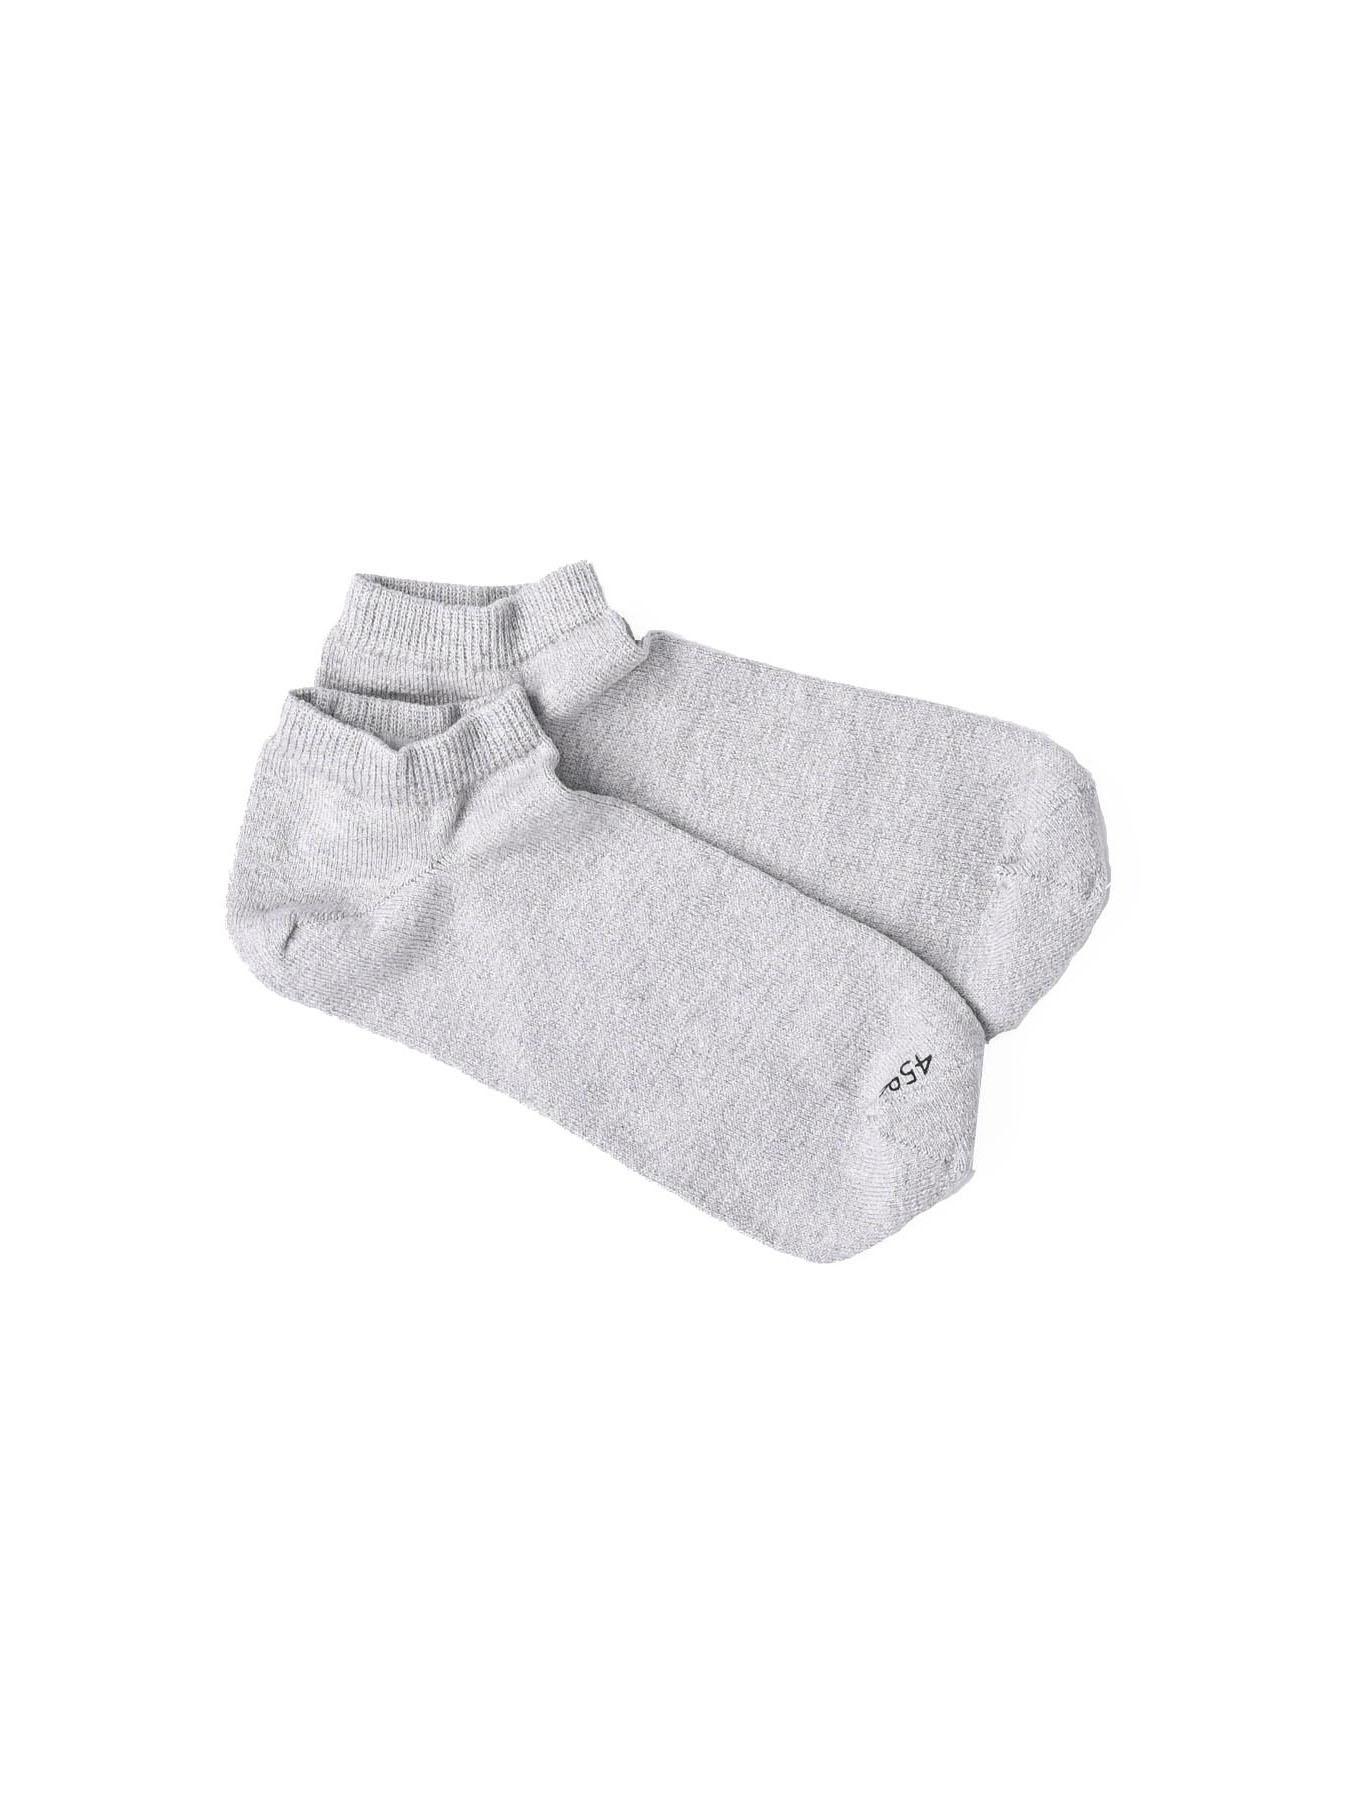 45 Star Ankle Socks (0421)-3